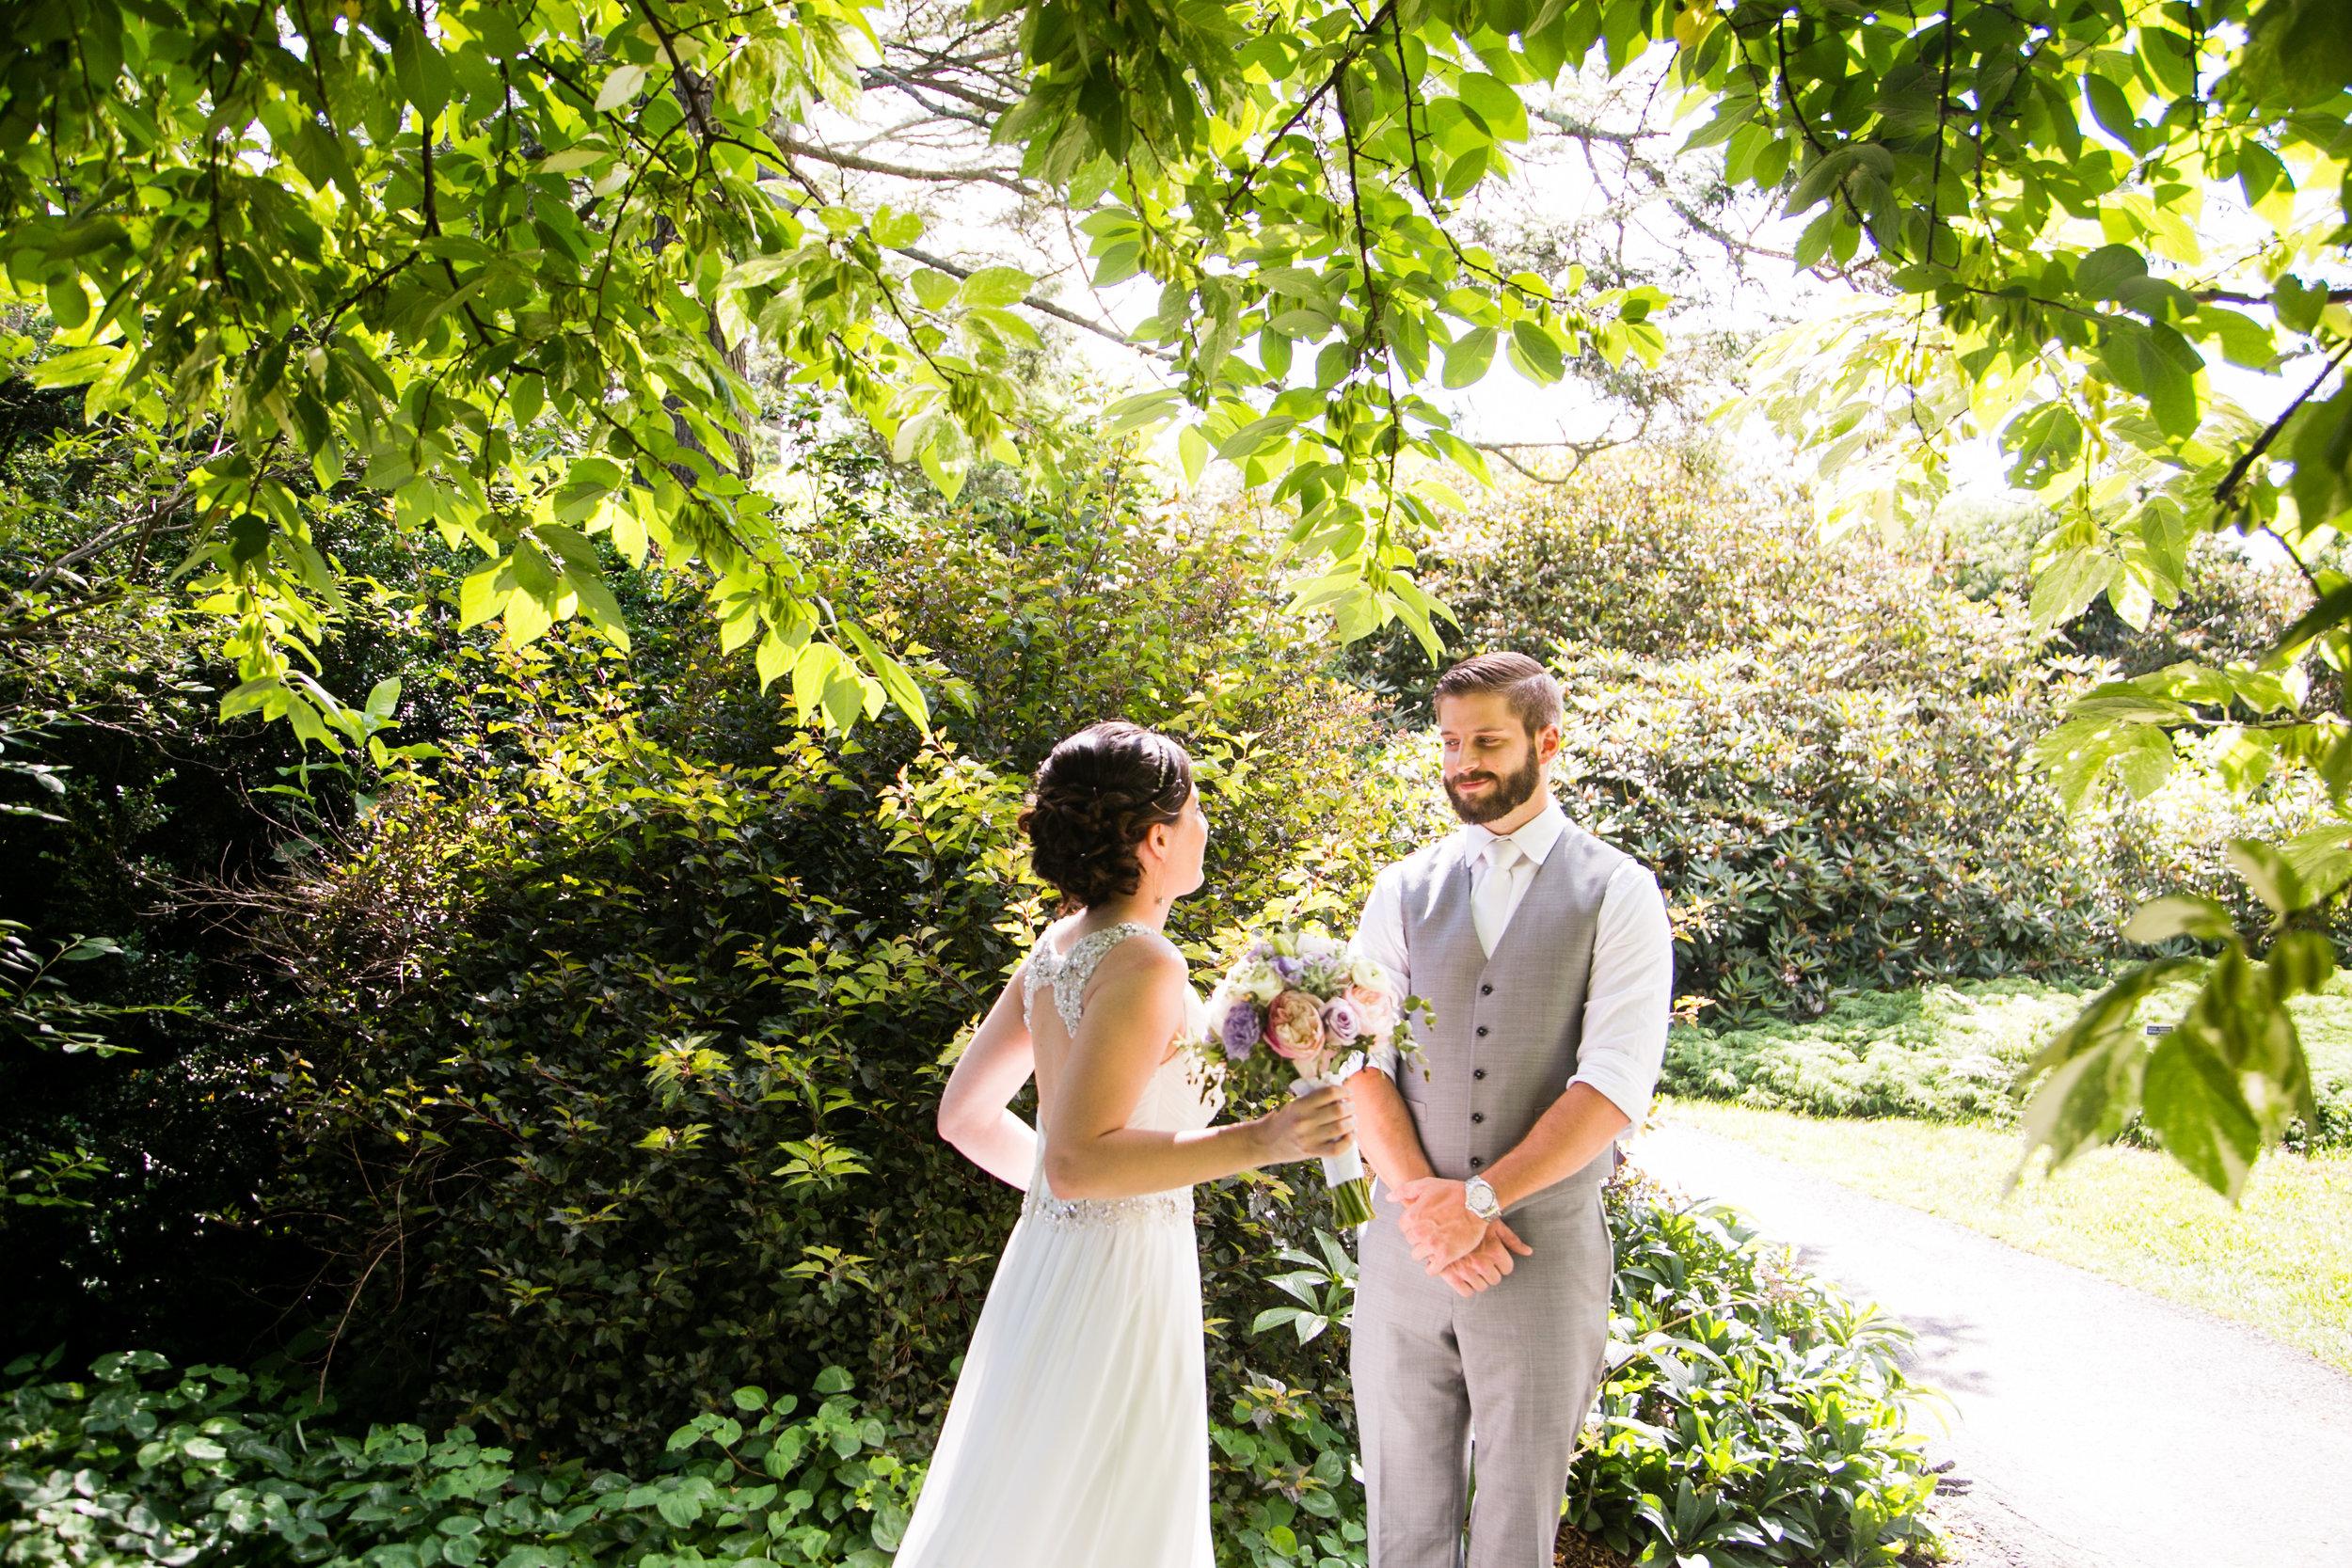 TYLER ARBORETUM WEDDING PHOTOGRAPHY LOVESTRUCK PICTURES-015.jpg